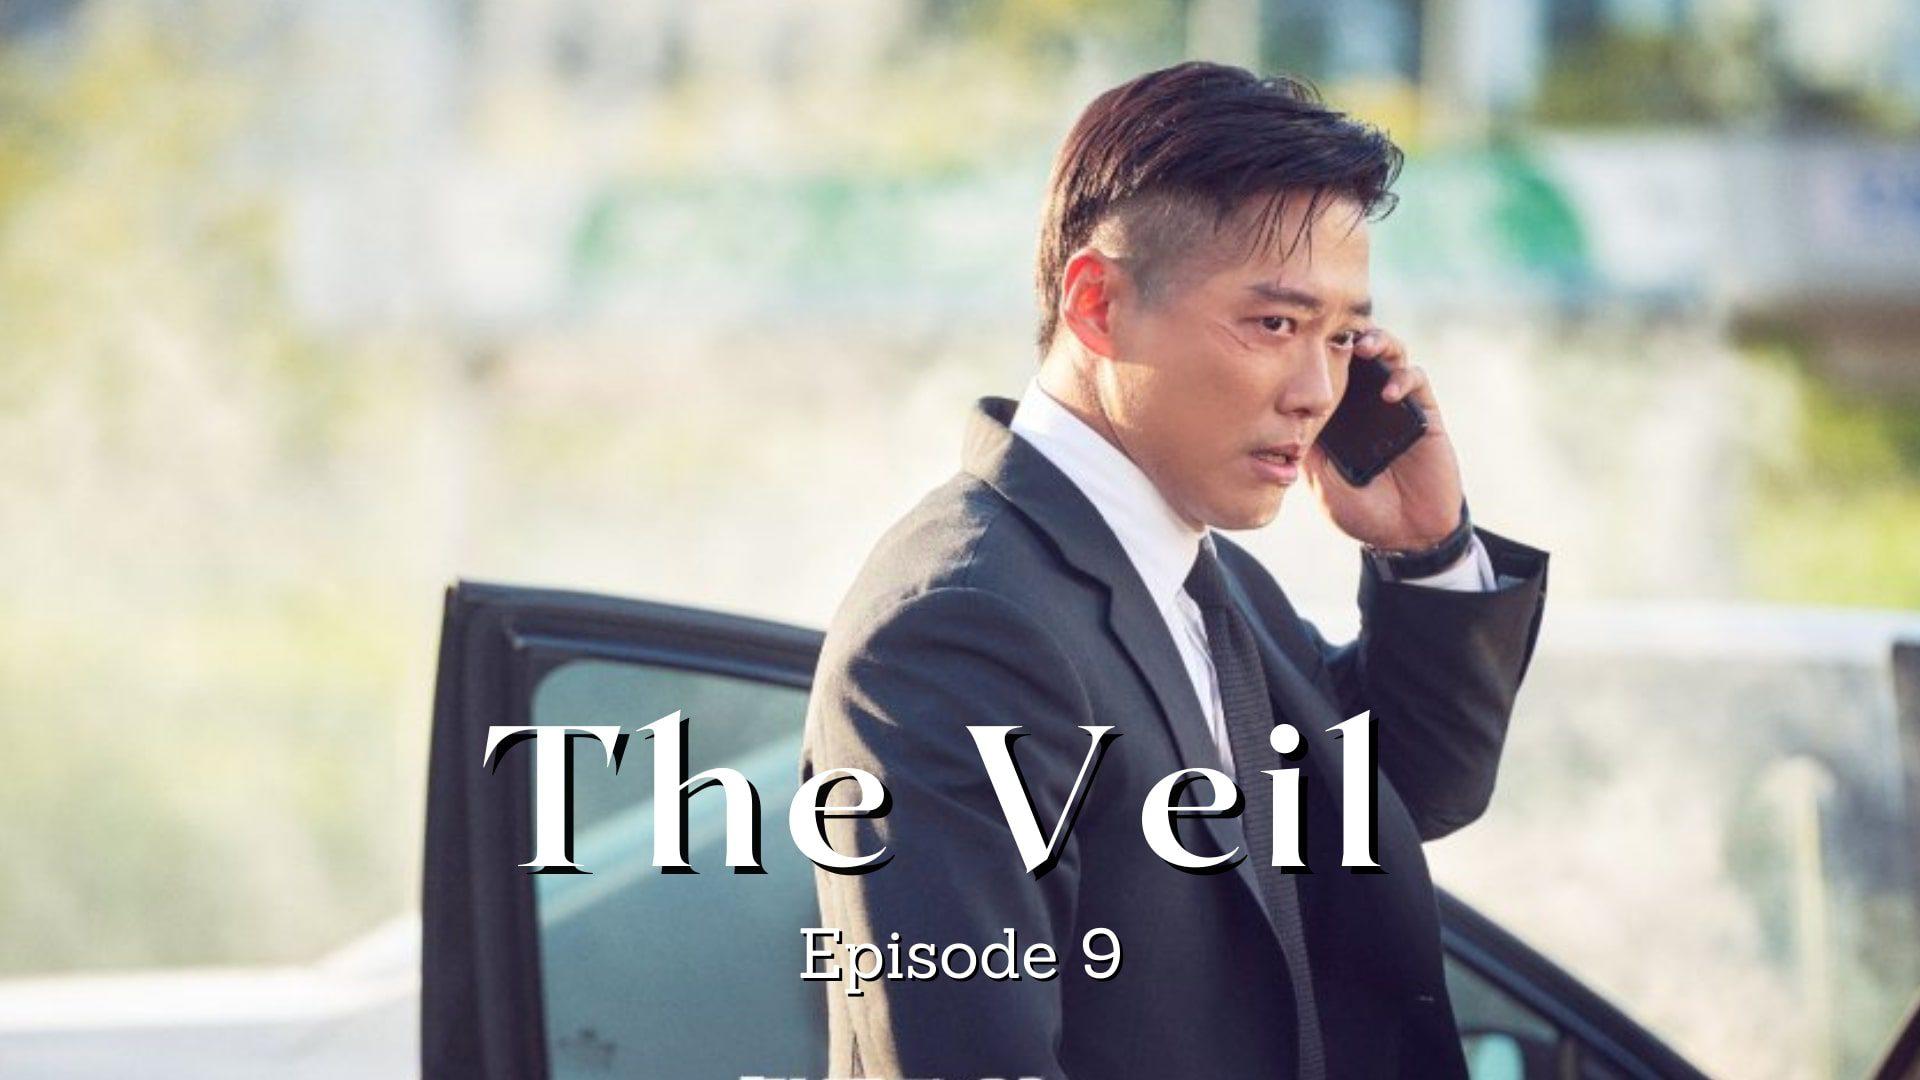 The Veil Episode 9